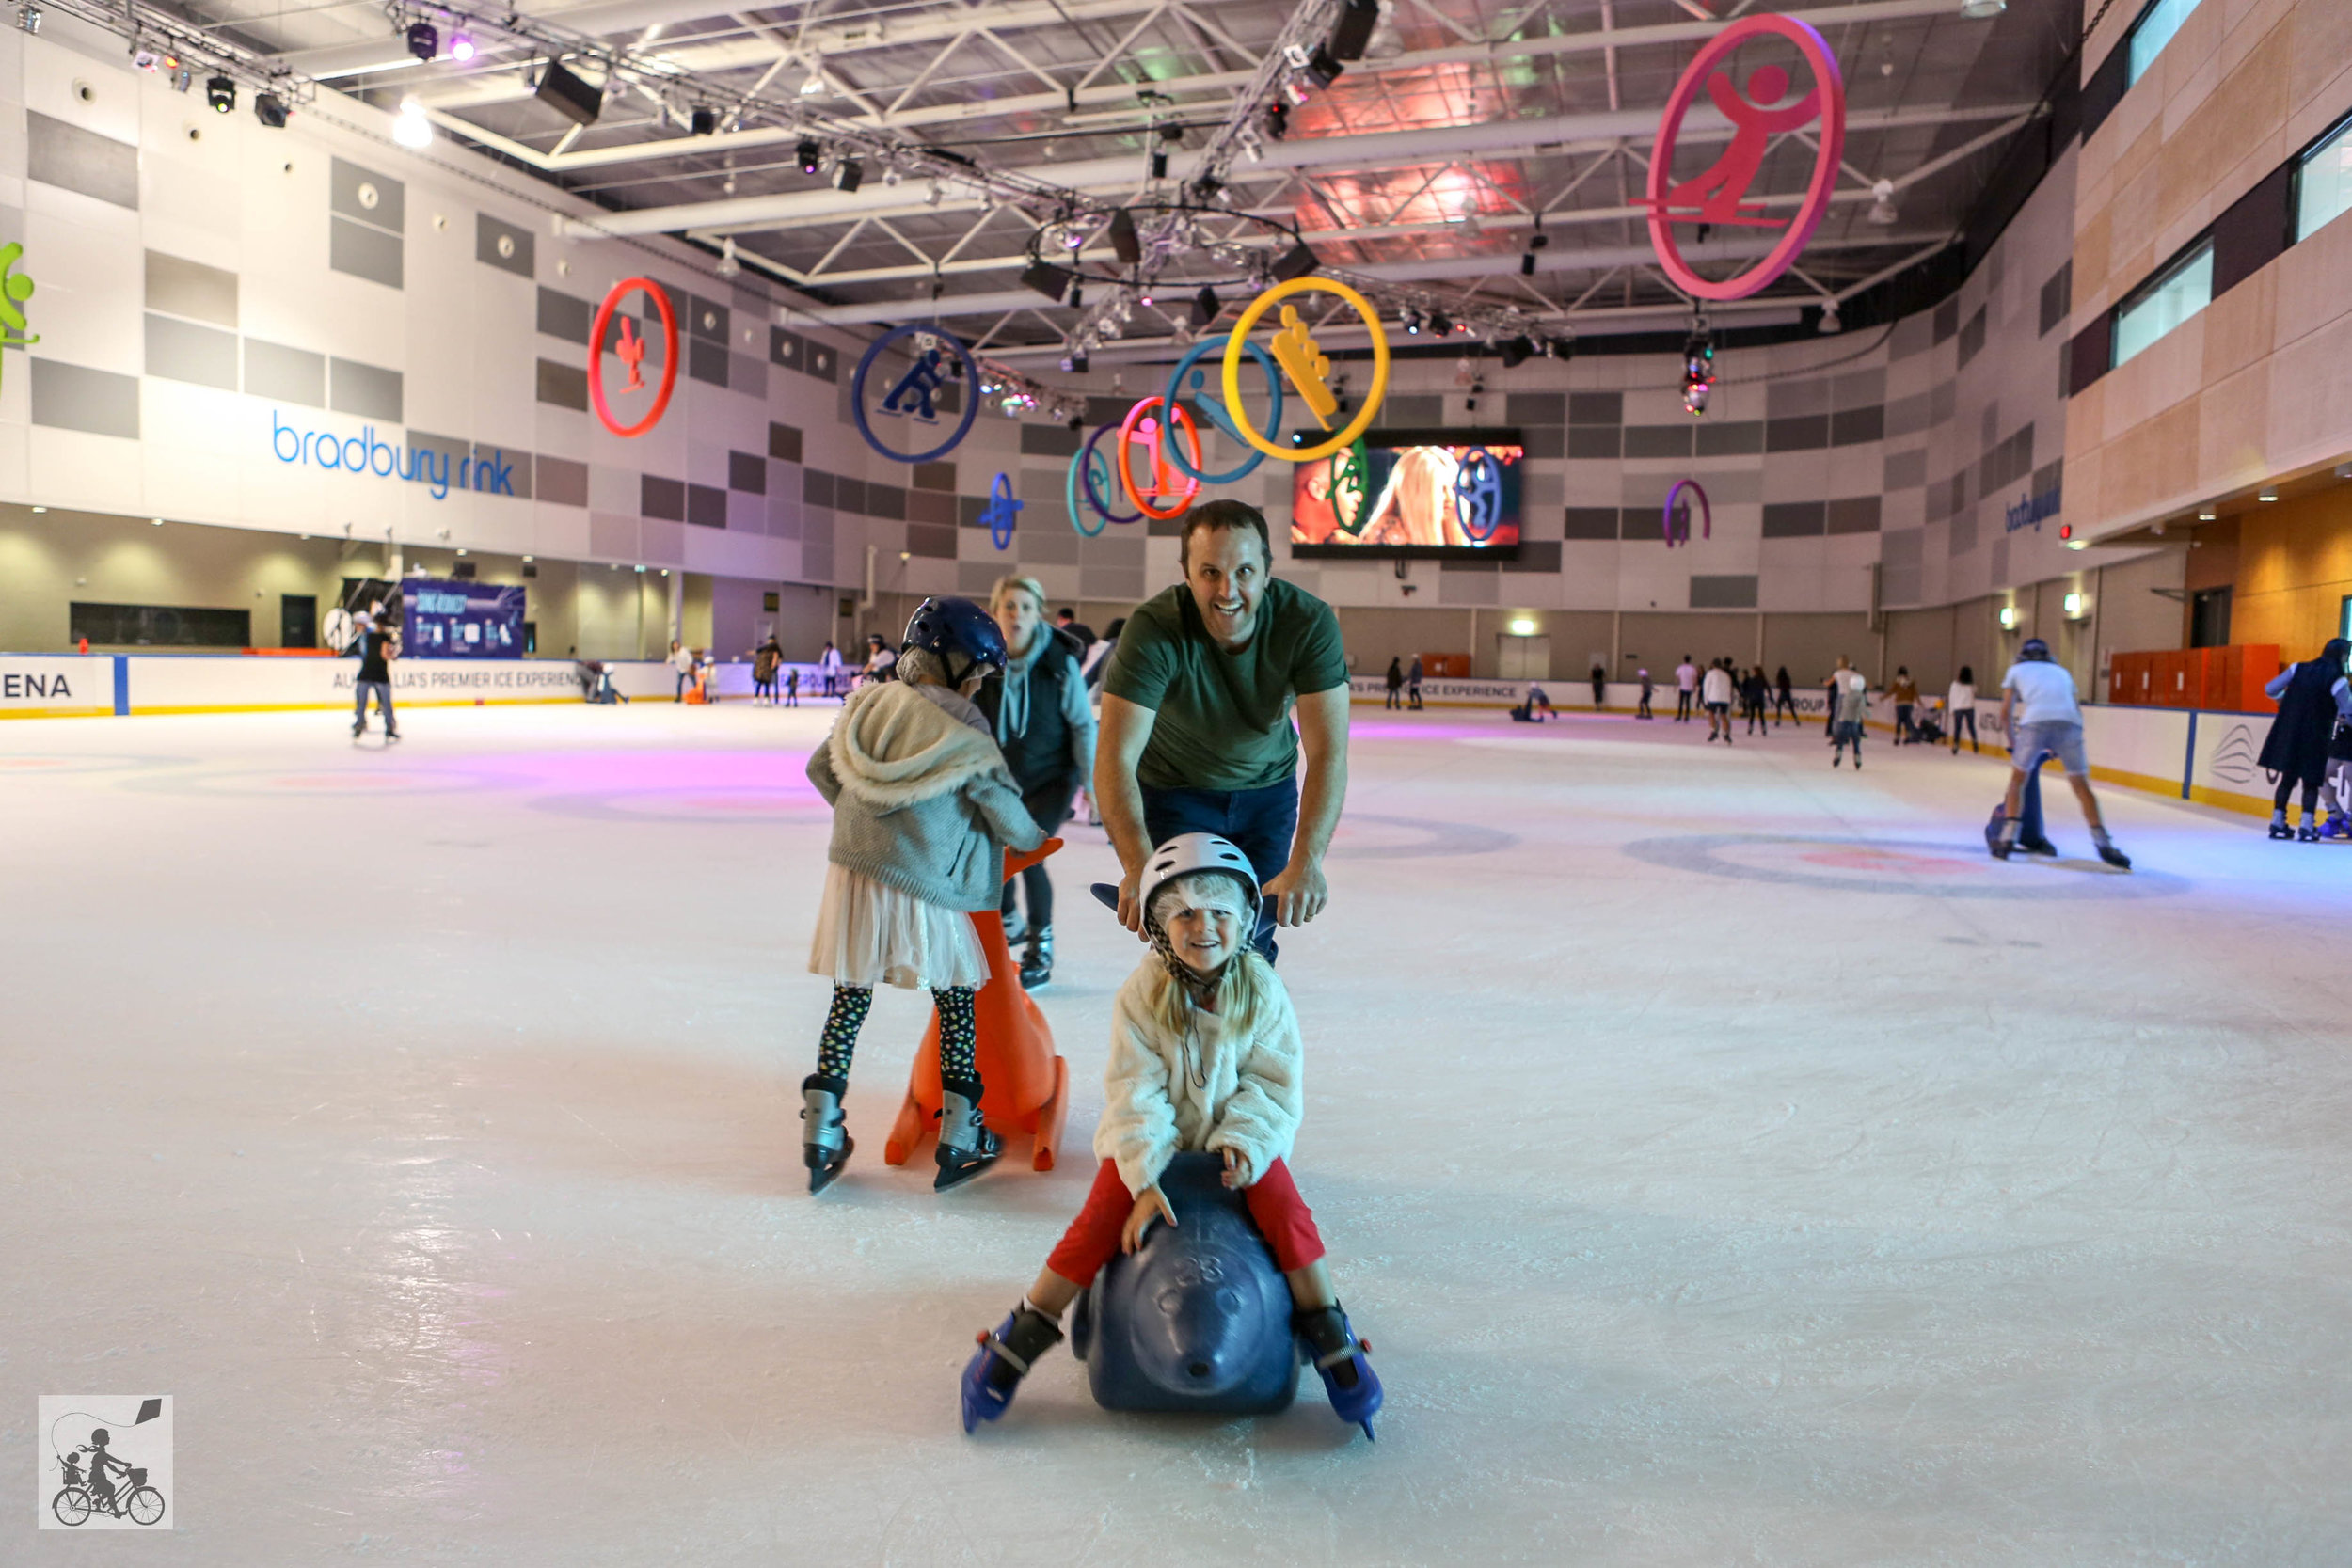 Ice Skating @ Obrien Group Arena